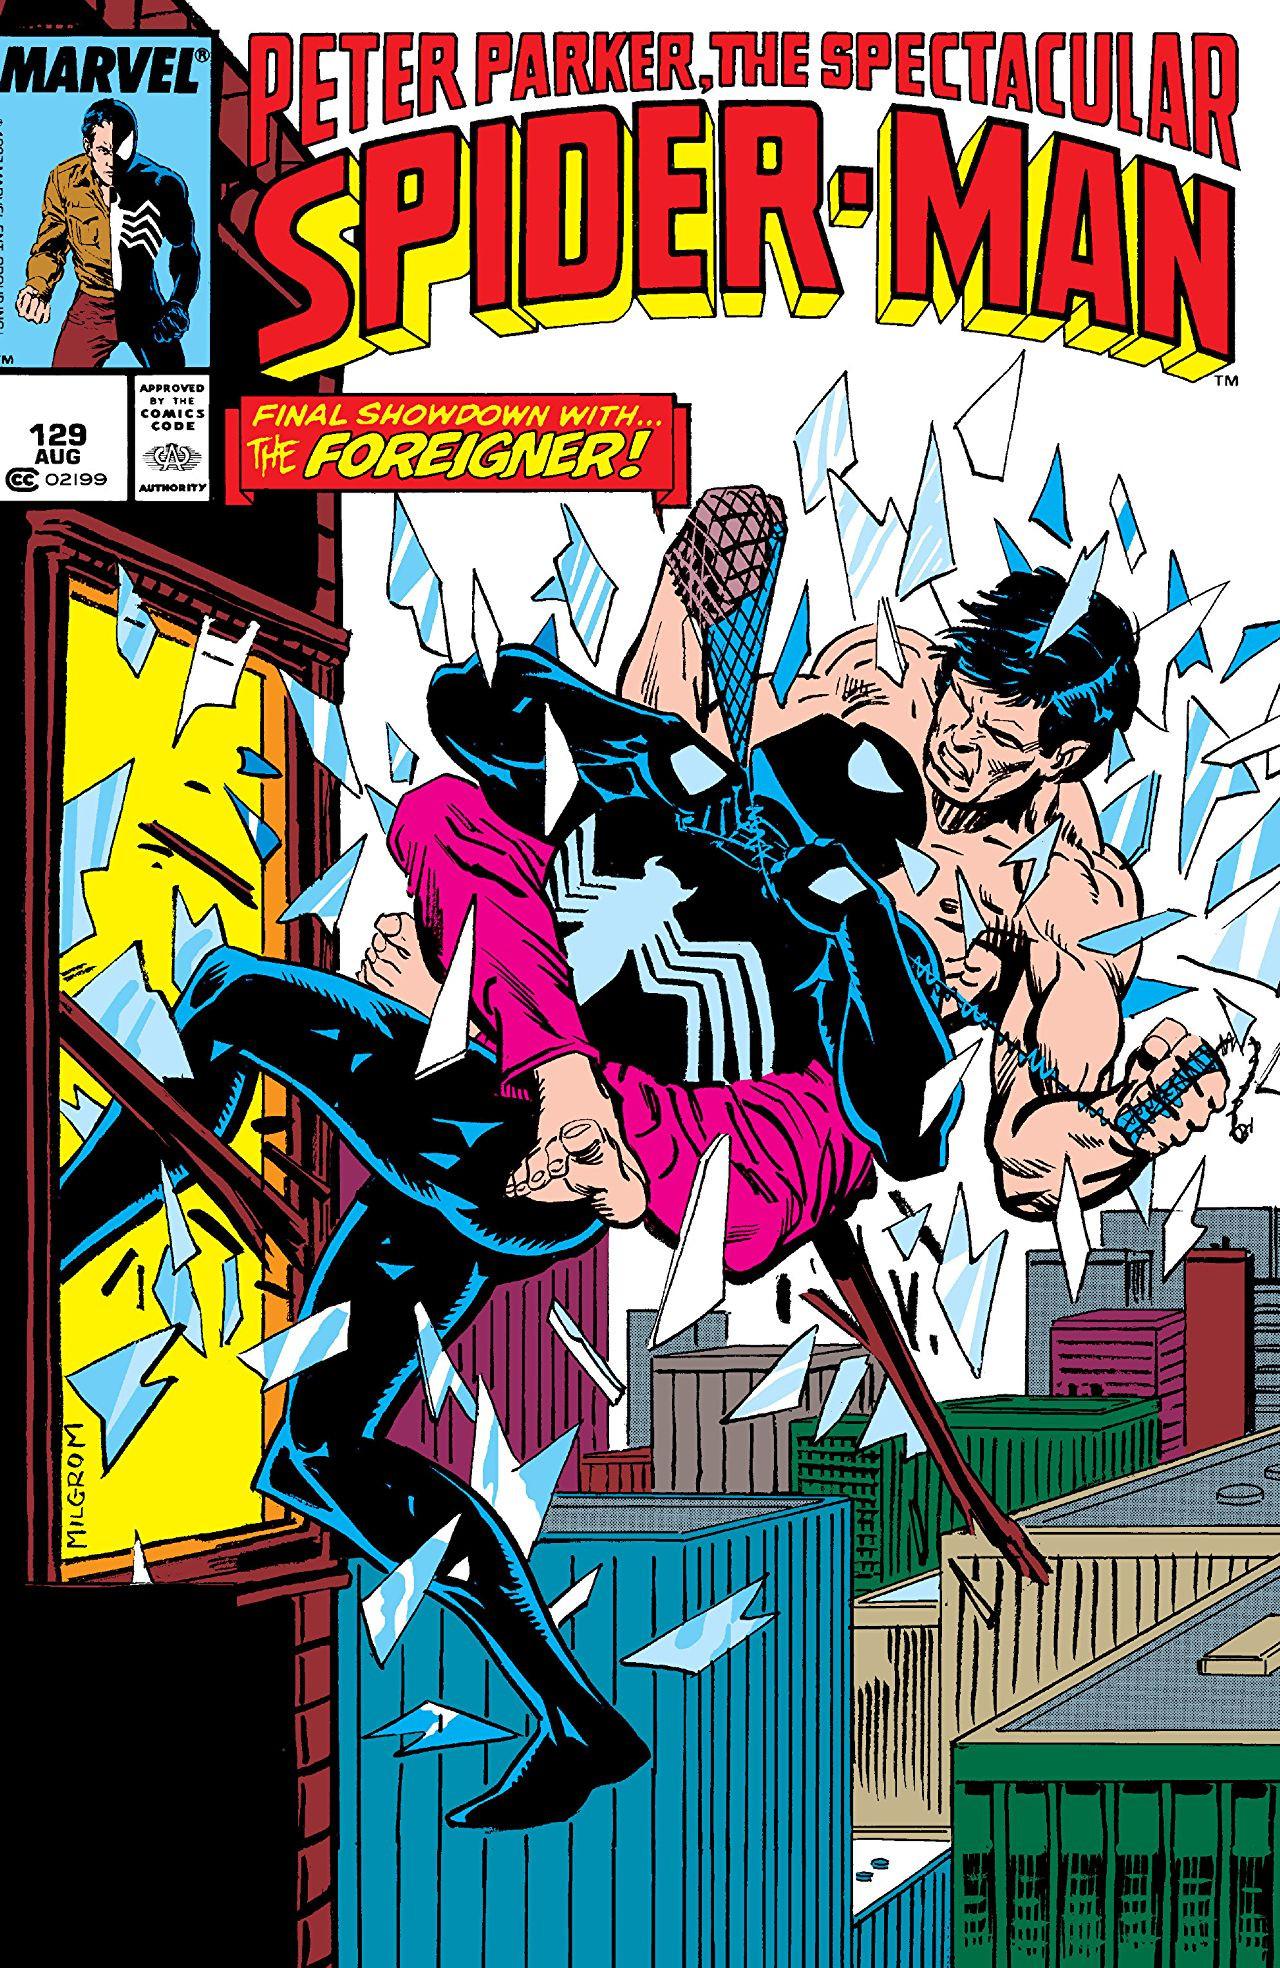 Peter Parker, The Spectacular Spider-Man Vol 1 129